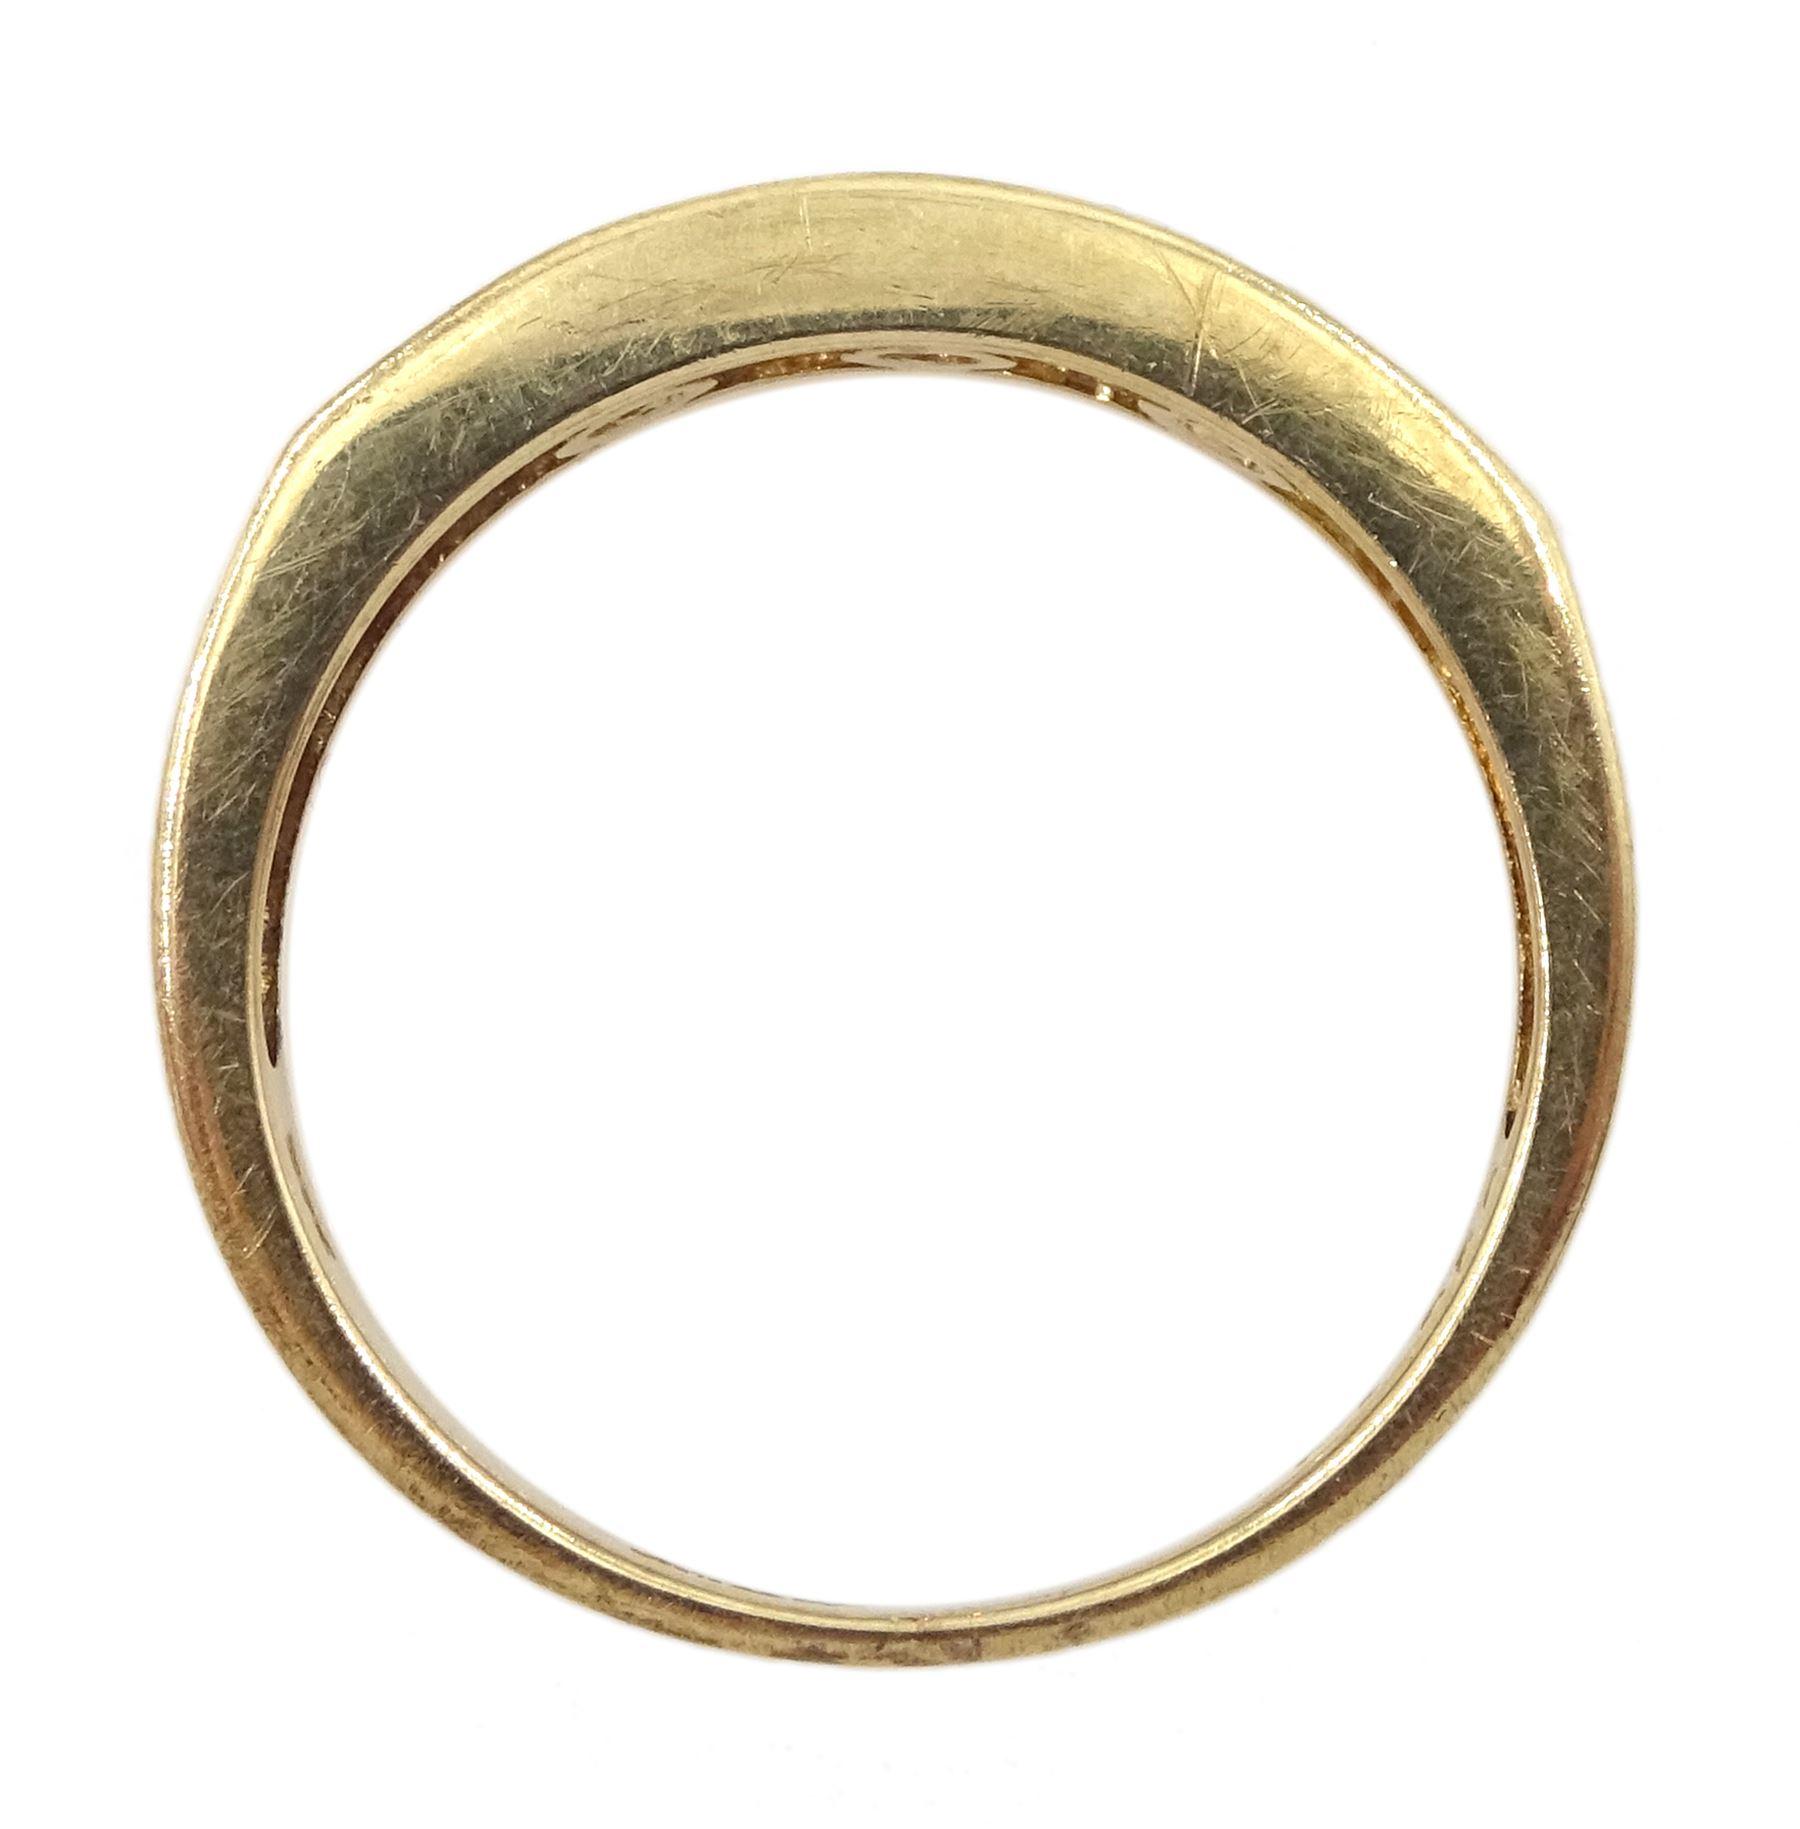 9ct gold round brilliant cut diamond seven stone channel set stone ring - Image 4 of 4